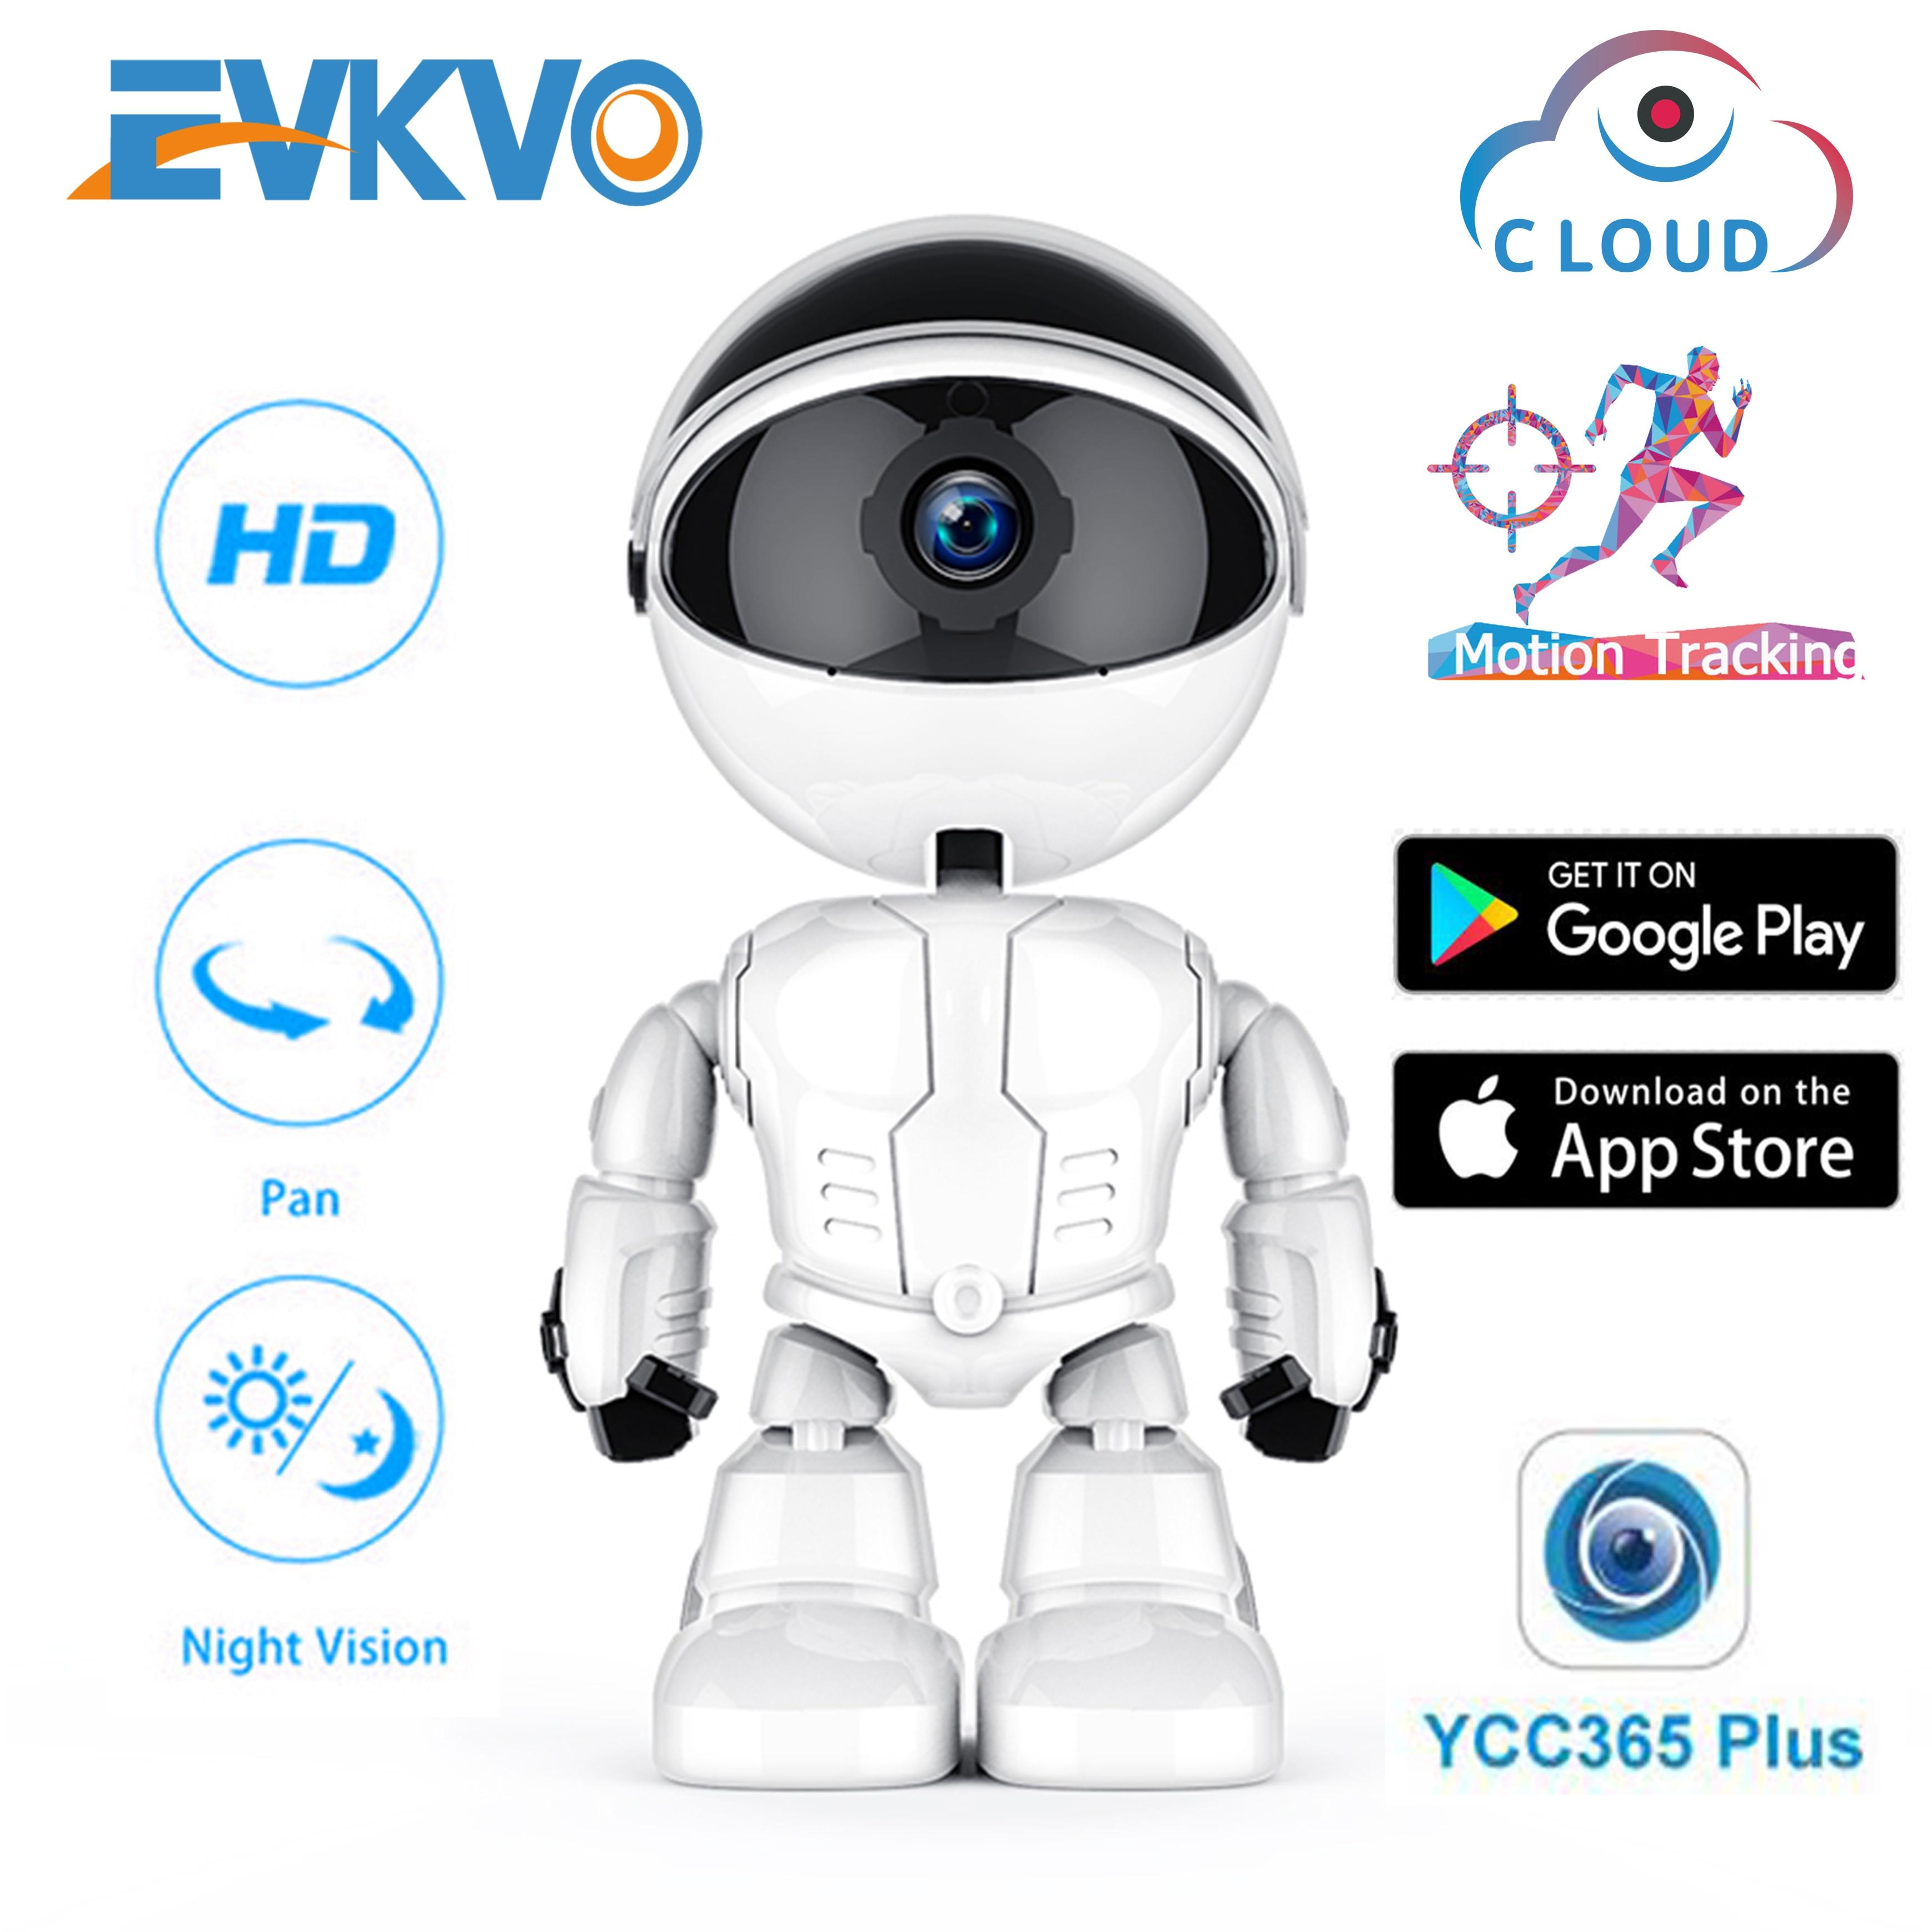 1080P الذكية كاميرا روبوت كاميرا شبكية عالية الوضوح واي فاي كاميرا لاسلكية مراقبة الطفل كشف الحركة للرؤية الليلية كاميرا الأمن YCC365 APP